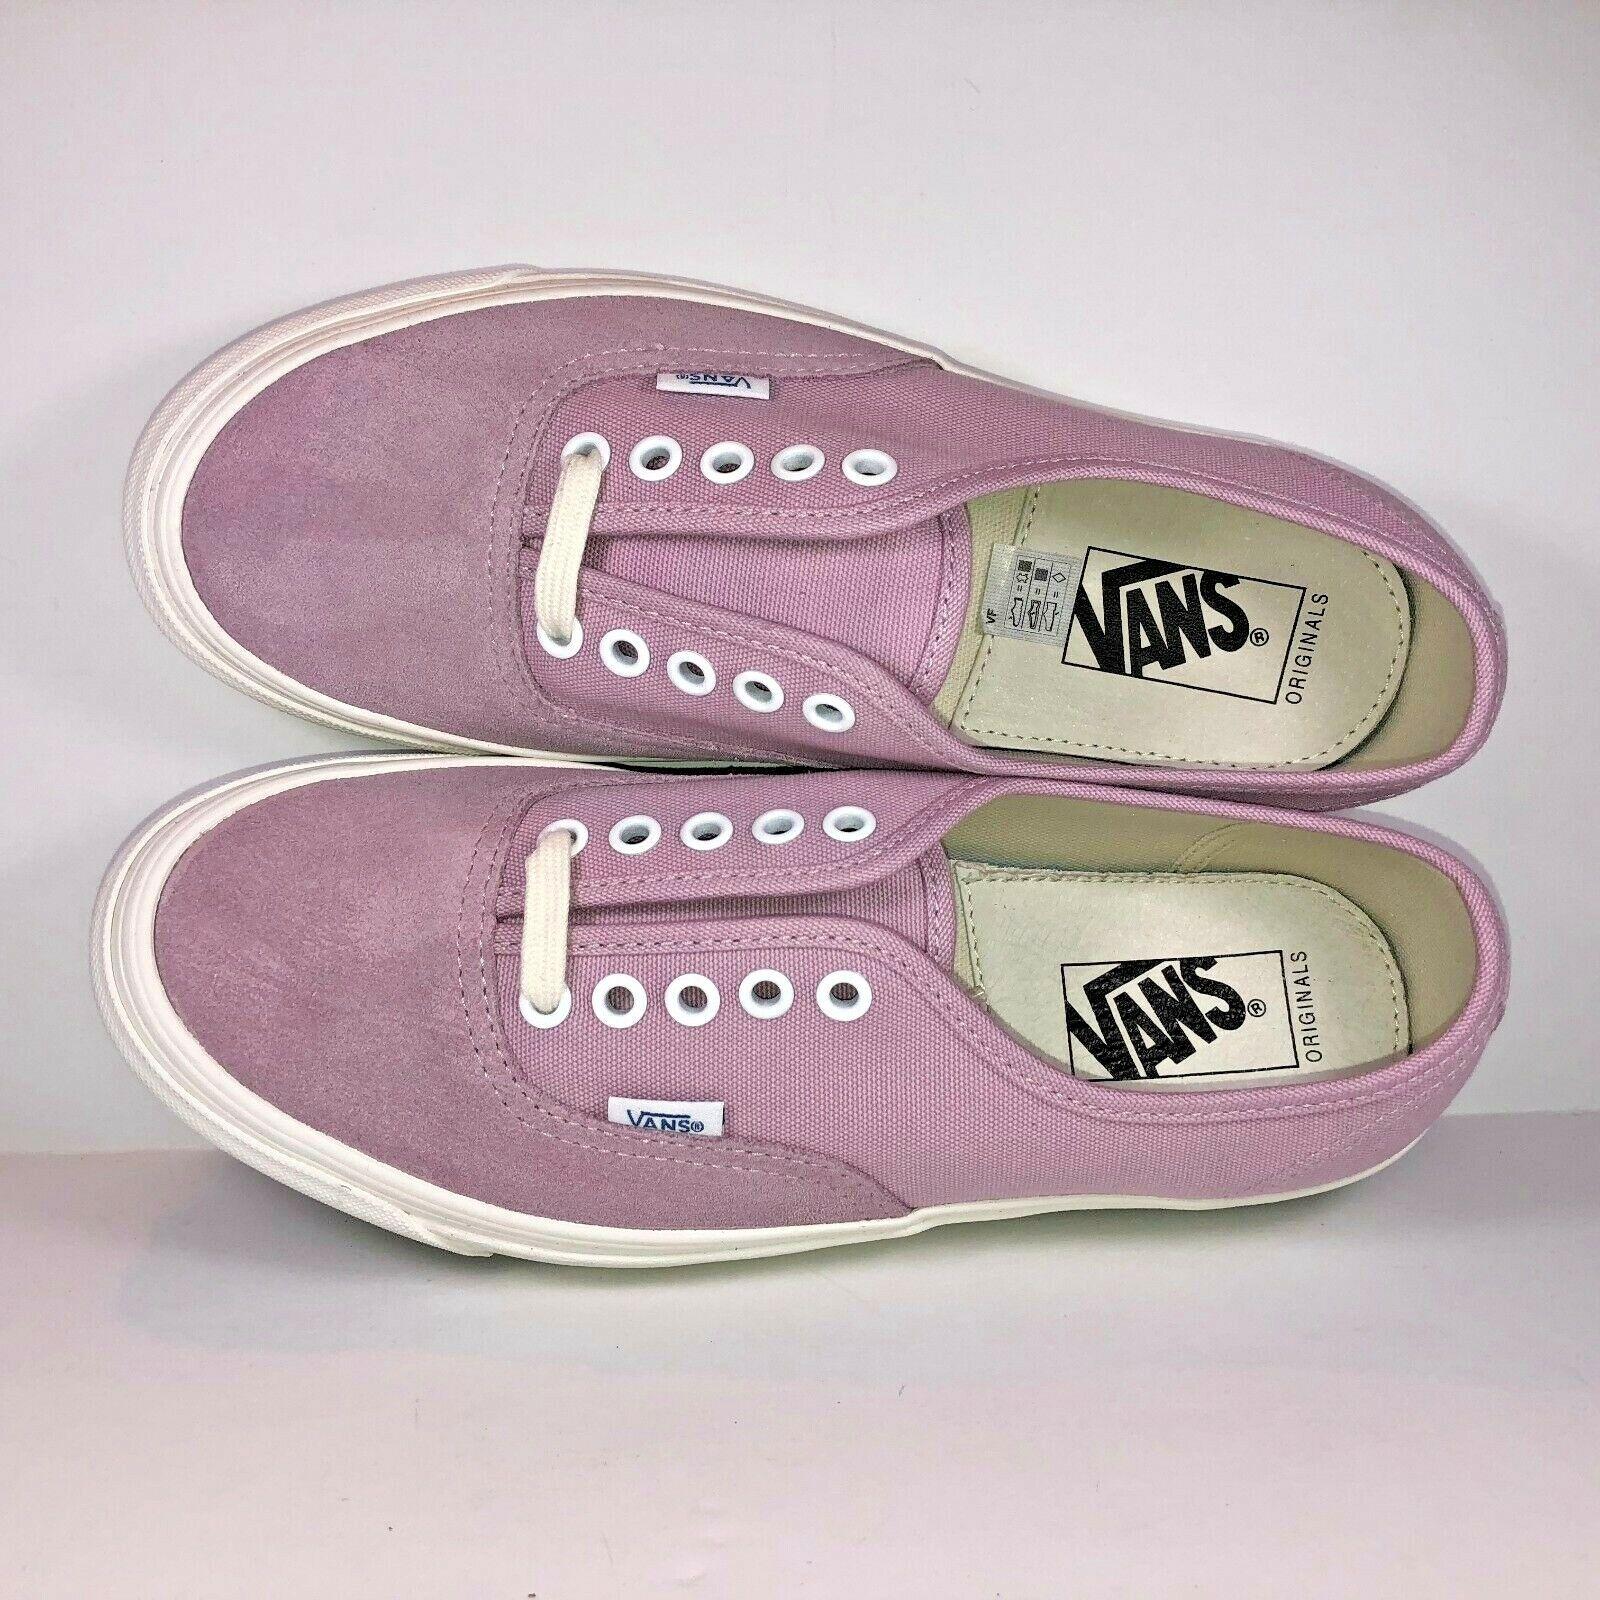 VANS OG Authentic LX Fragrant purplec Pink & White Sneakers VN000UDDN8N Size 7.5